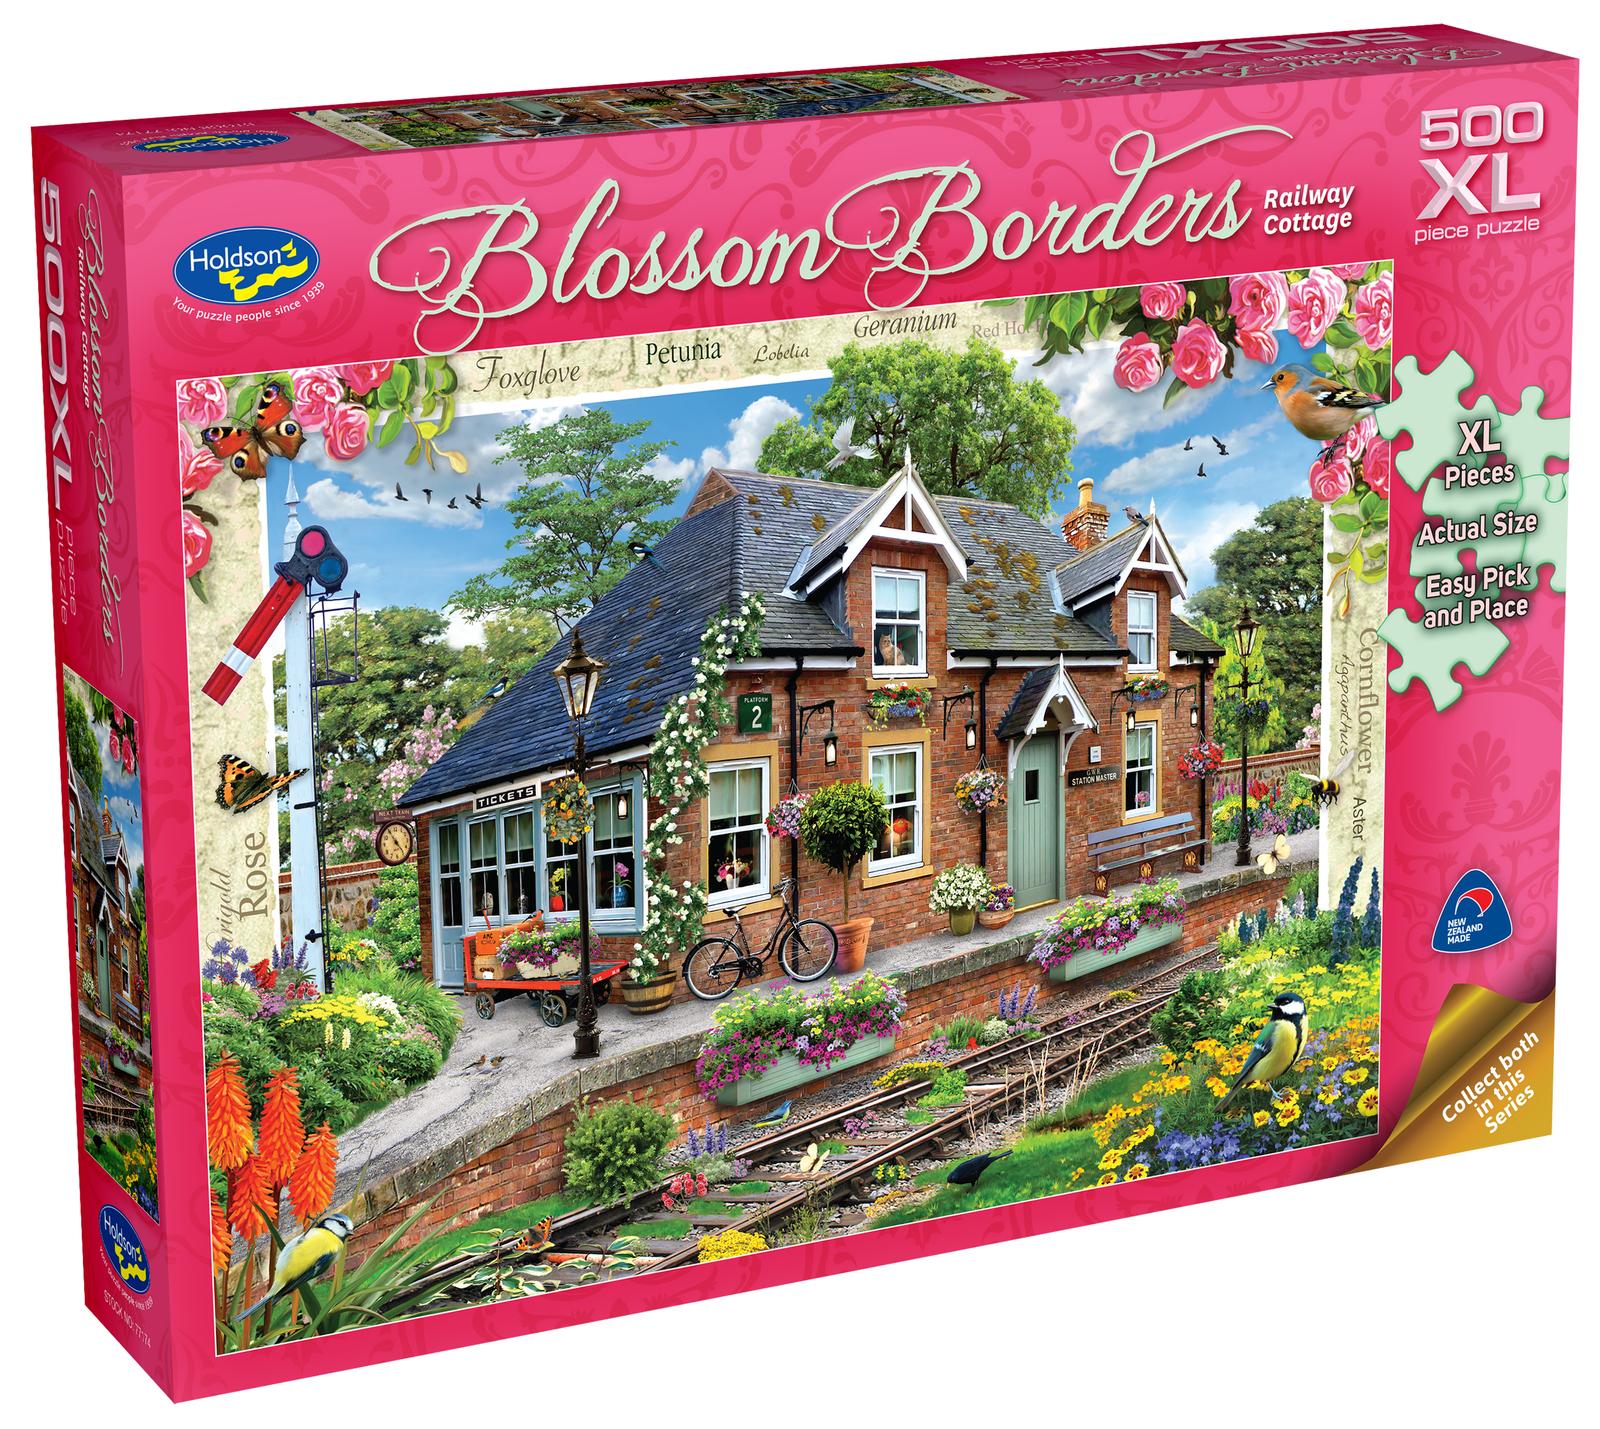 Holdson XL: 500 Piece Puzzle - Blossom Borders (Railway Cottage) image